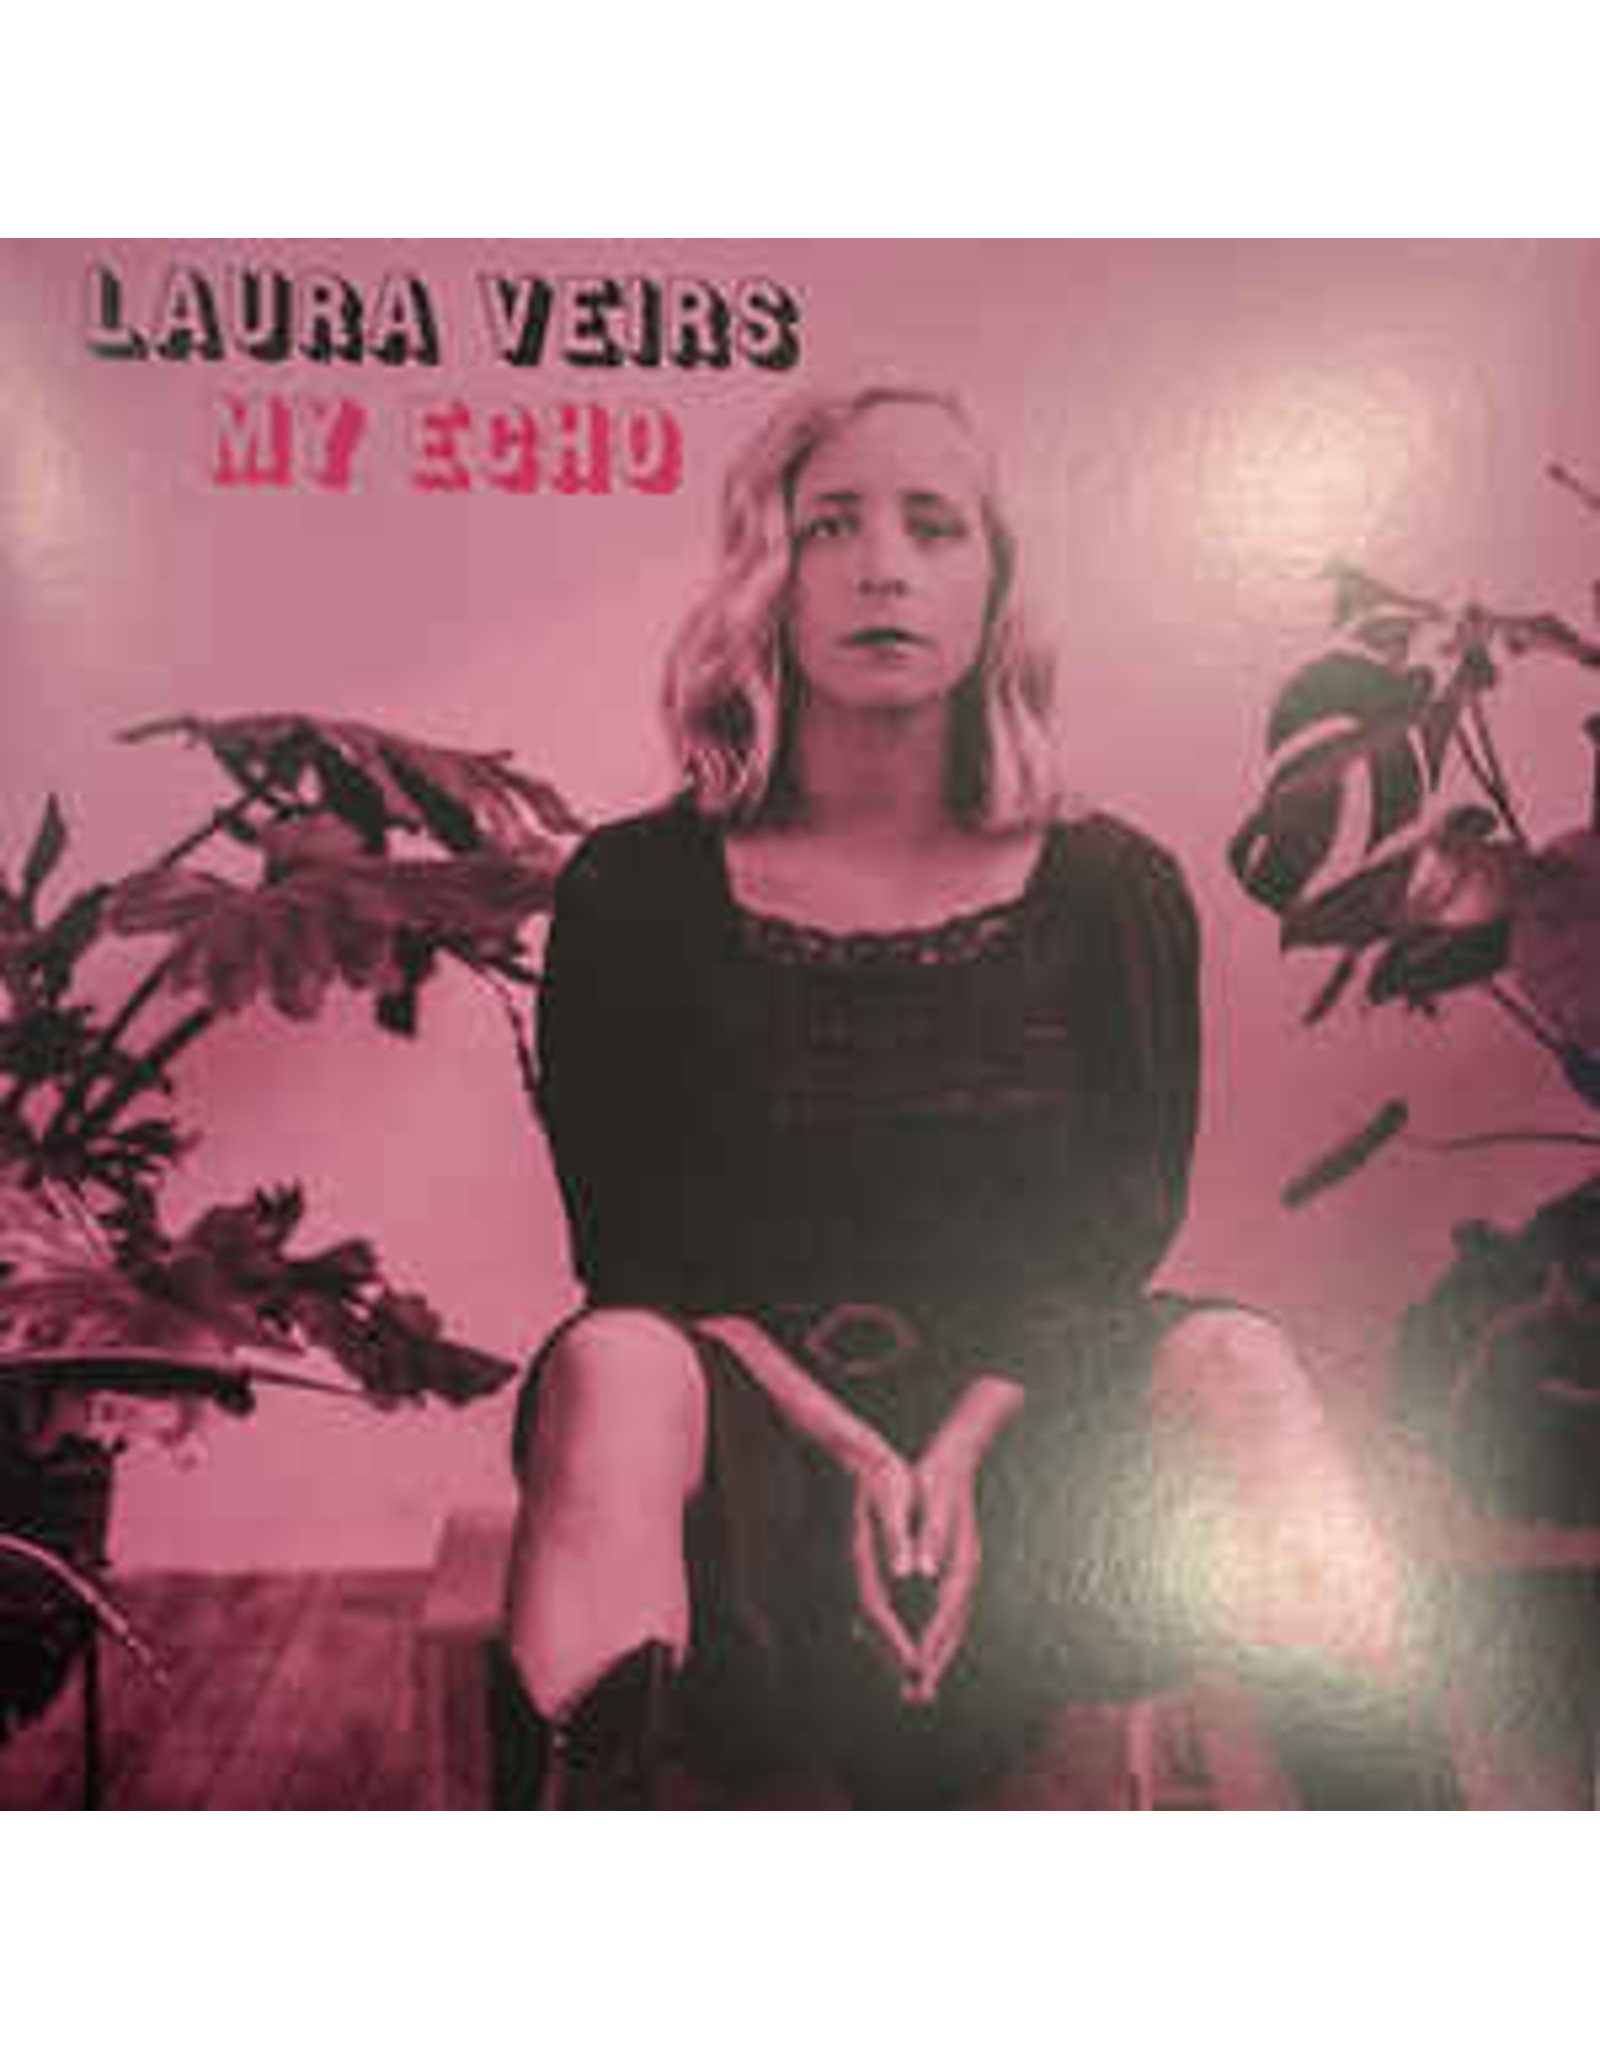 Veirs,Laura/My Echo